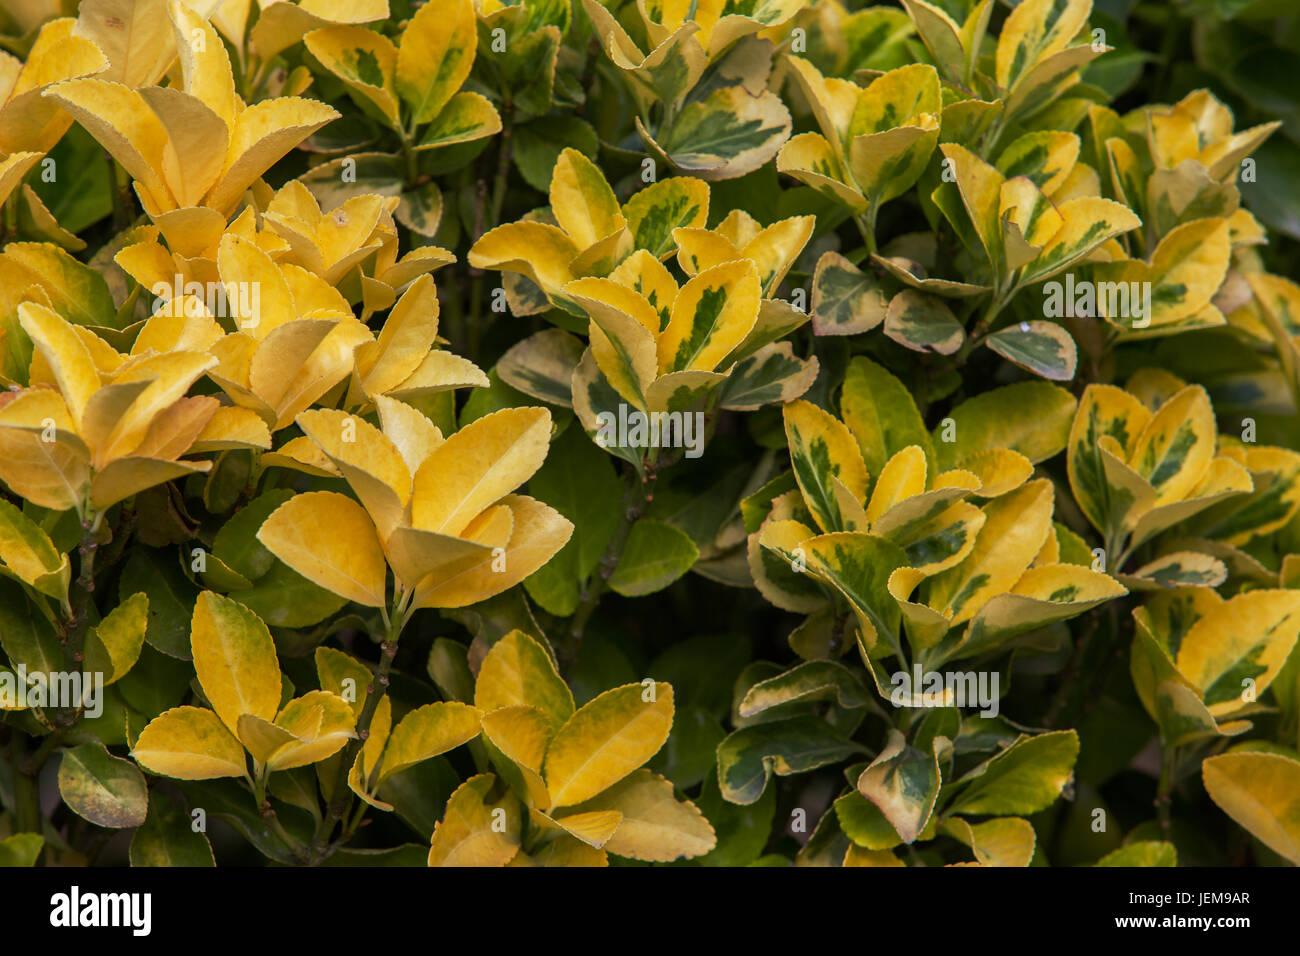 Gold Euonymus garden plant Stock Photo Royalty Free Image